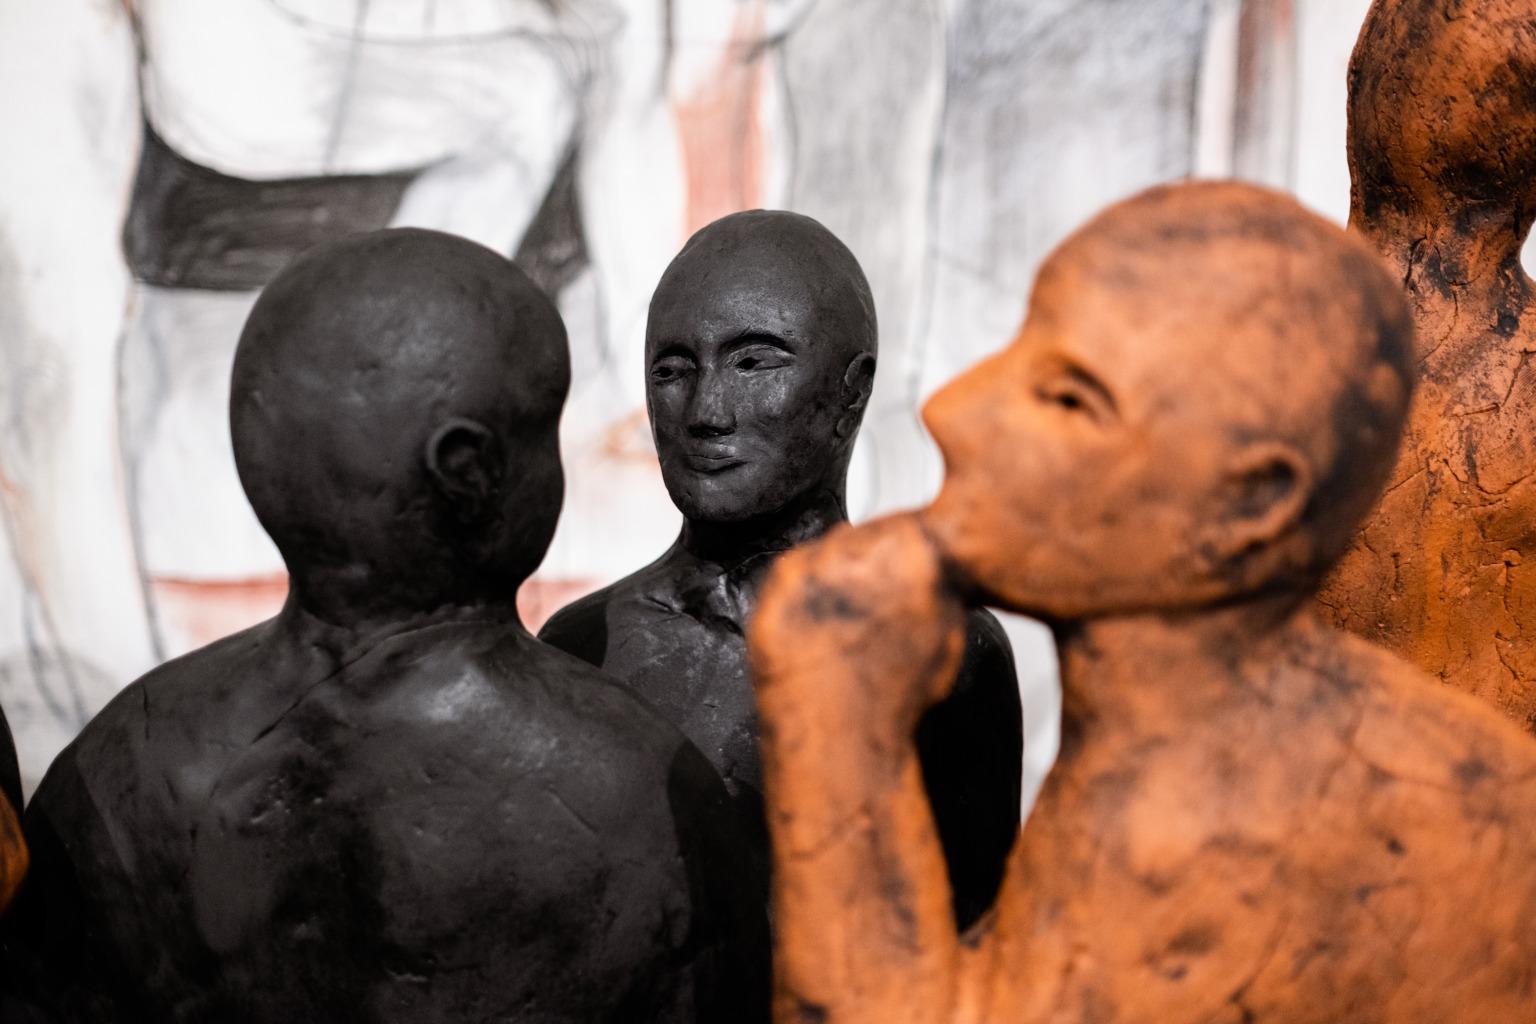 Three sculptural human figures.